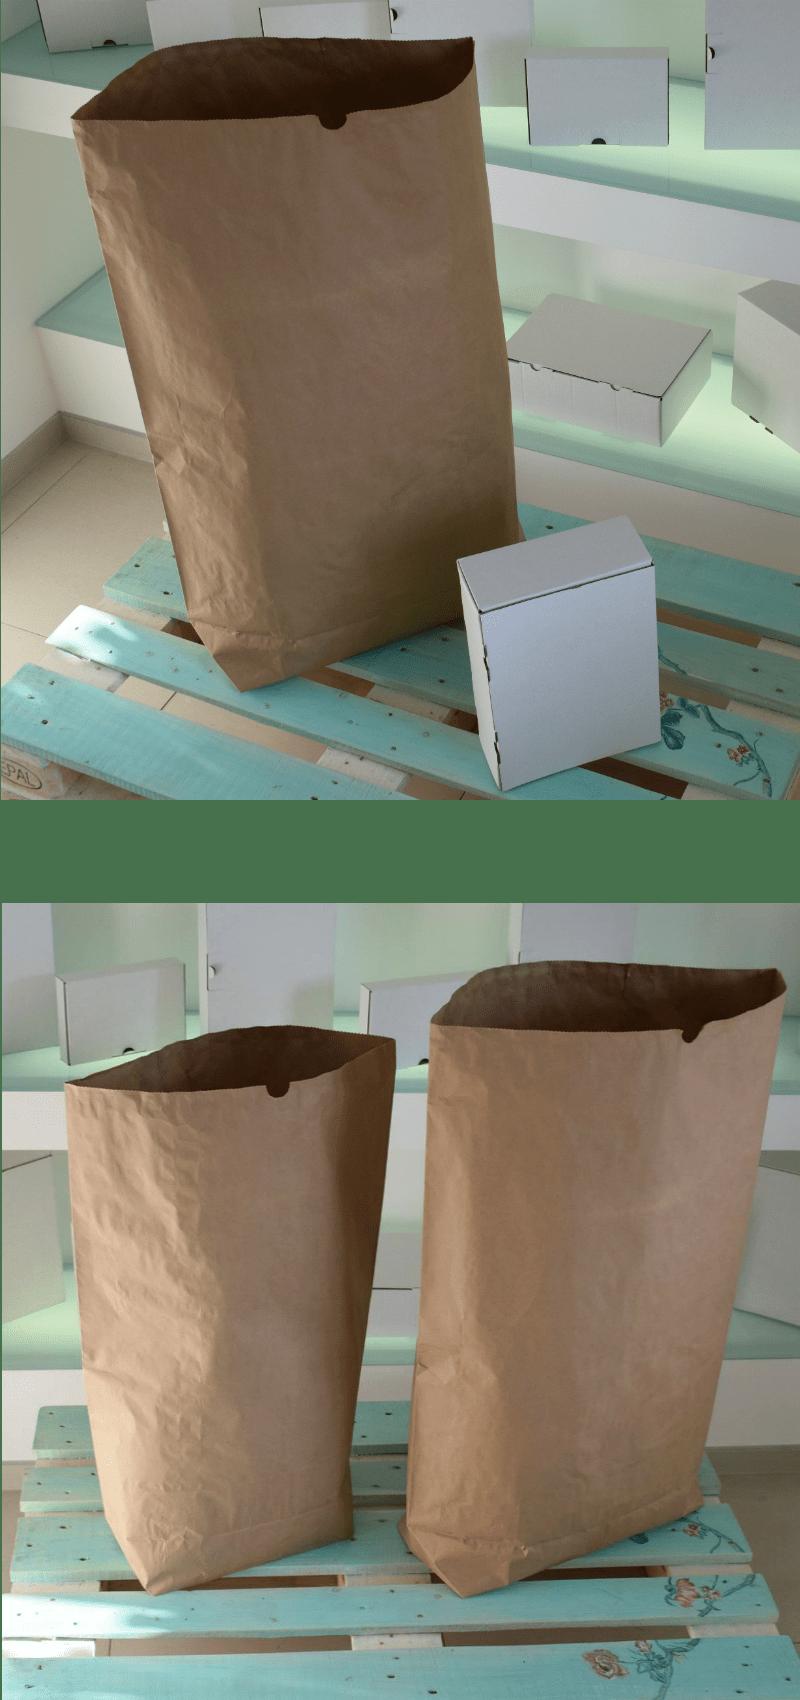 Papiersäcke Hersteller, Papiersäcke kaufen, Papiersäcke - As-kartons.de